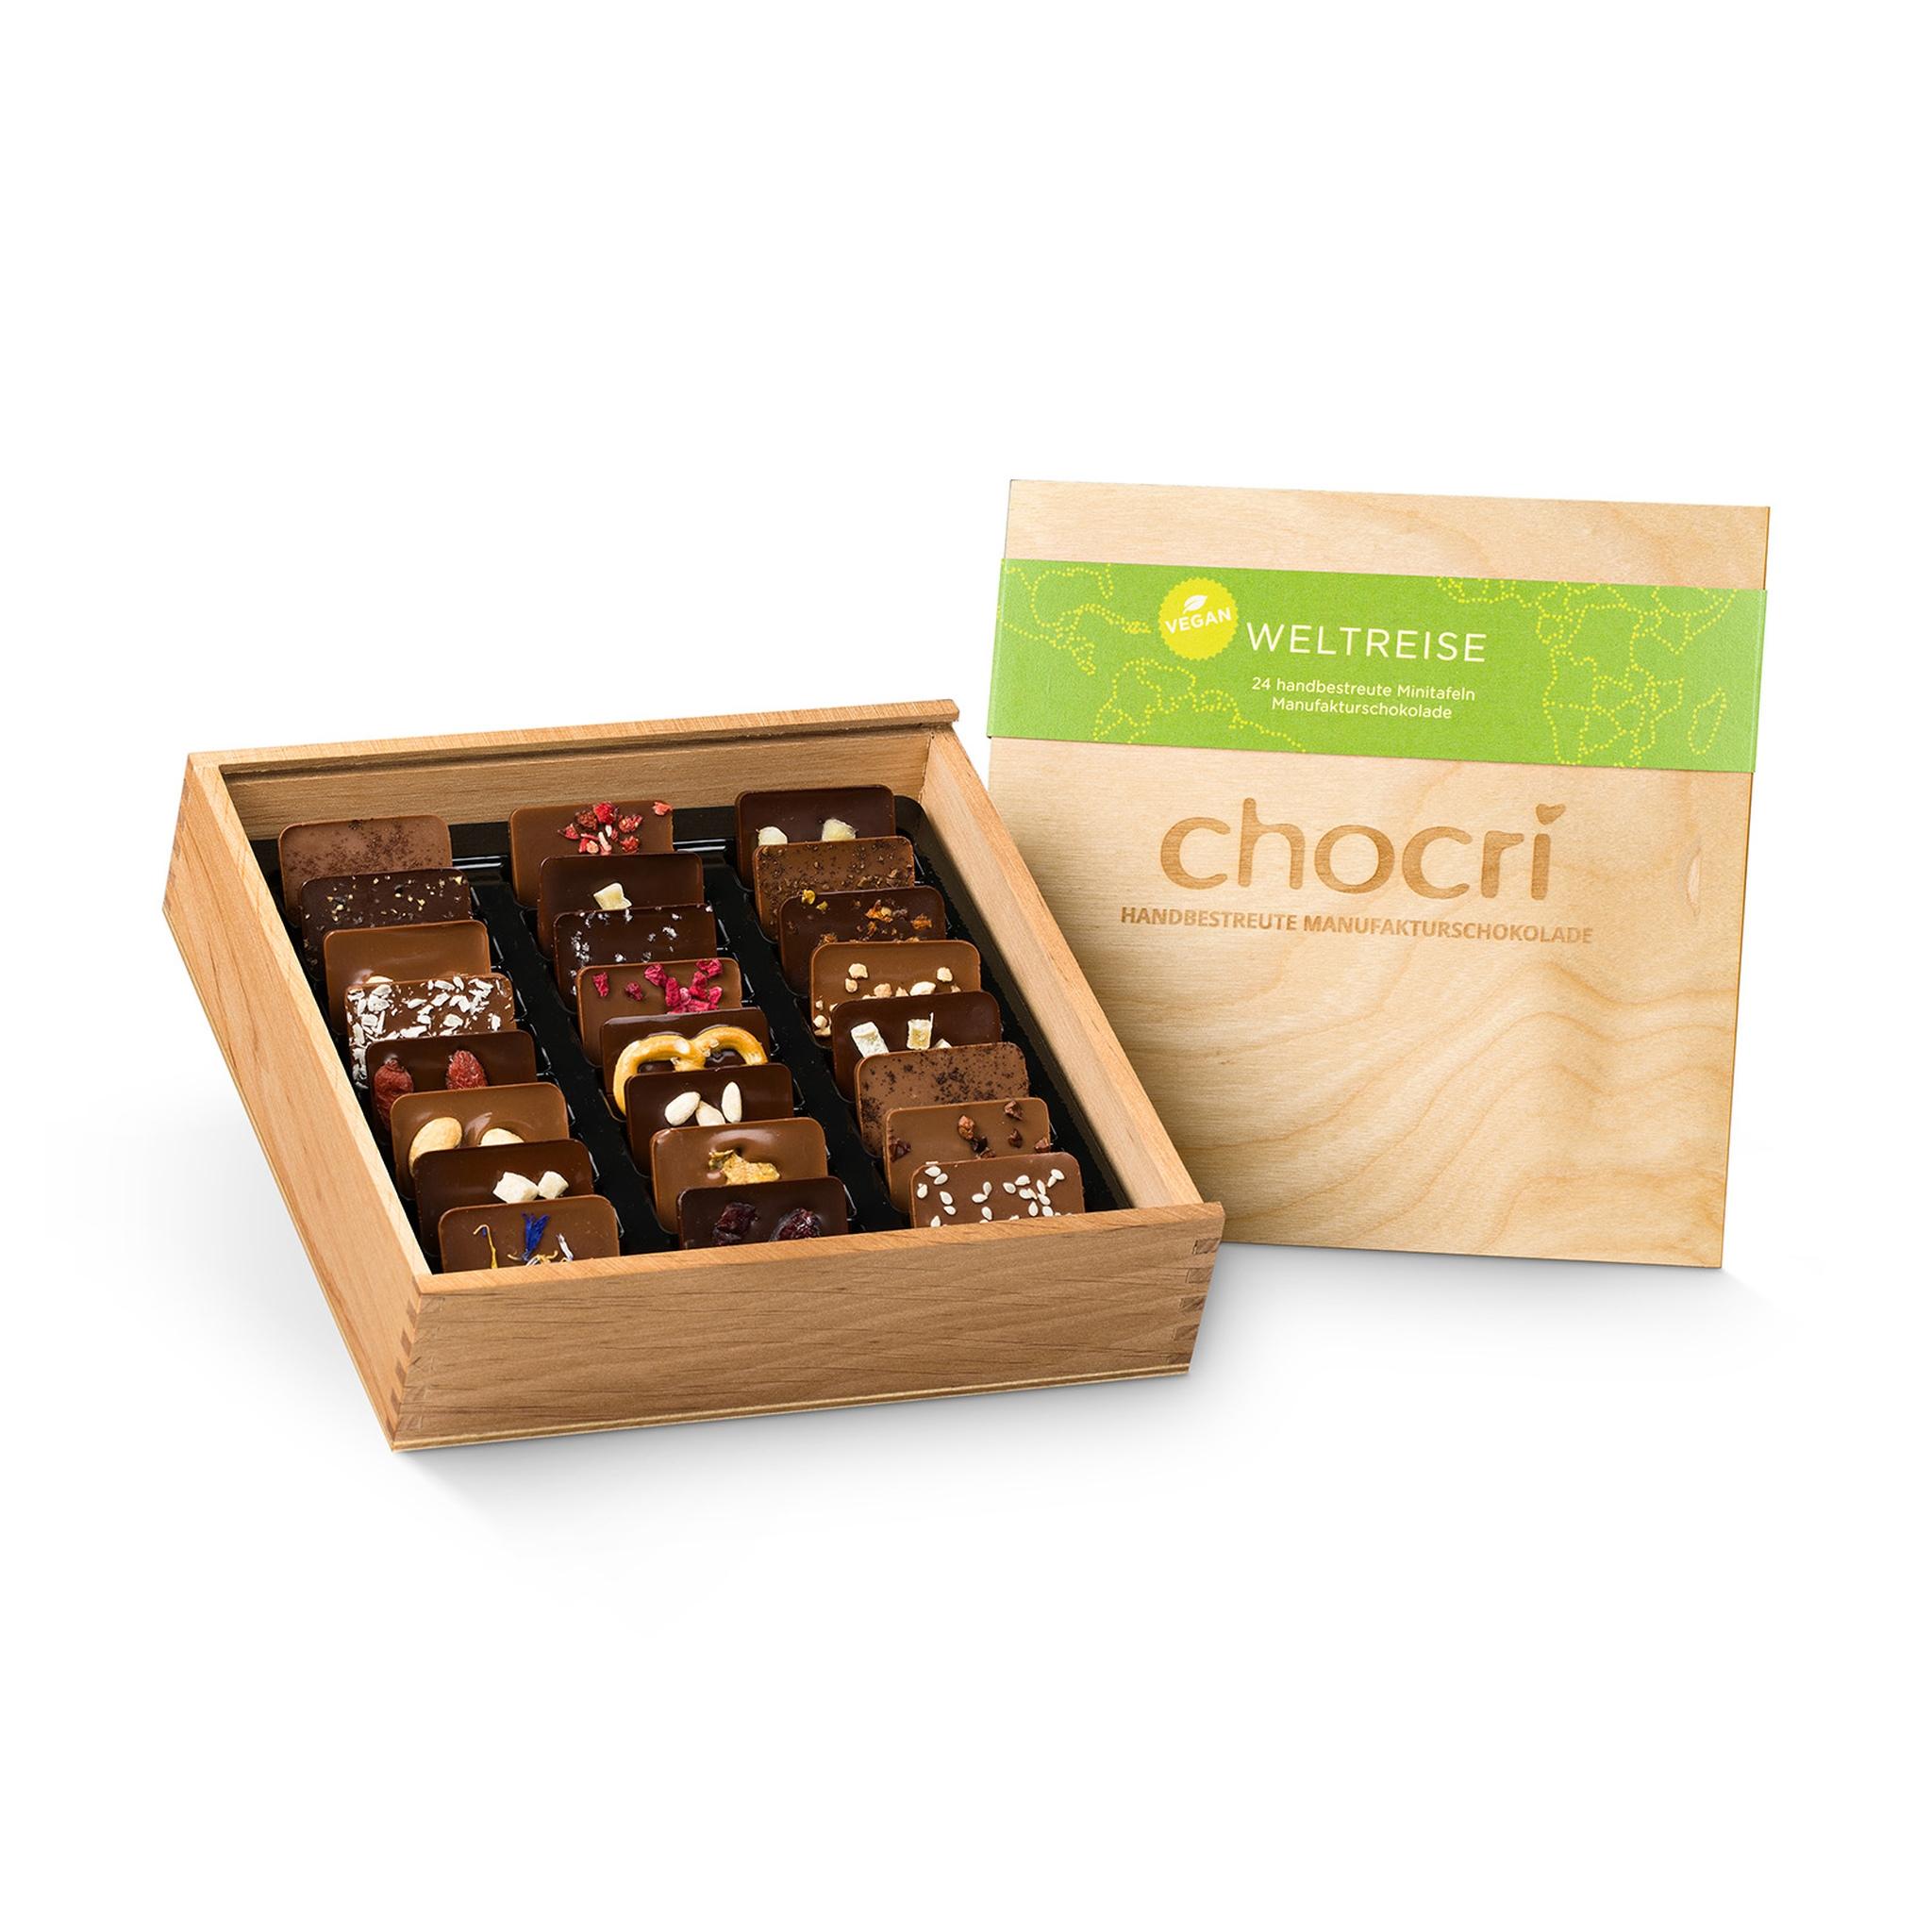 chocri Weltreise® 'Vegan' in edler Holz-Box